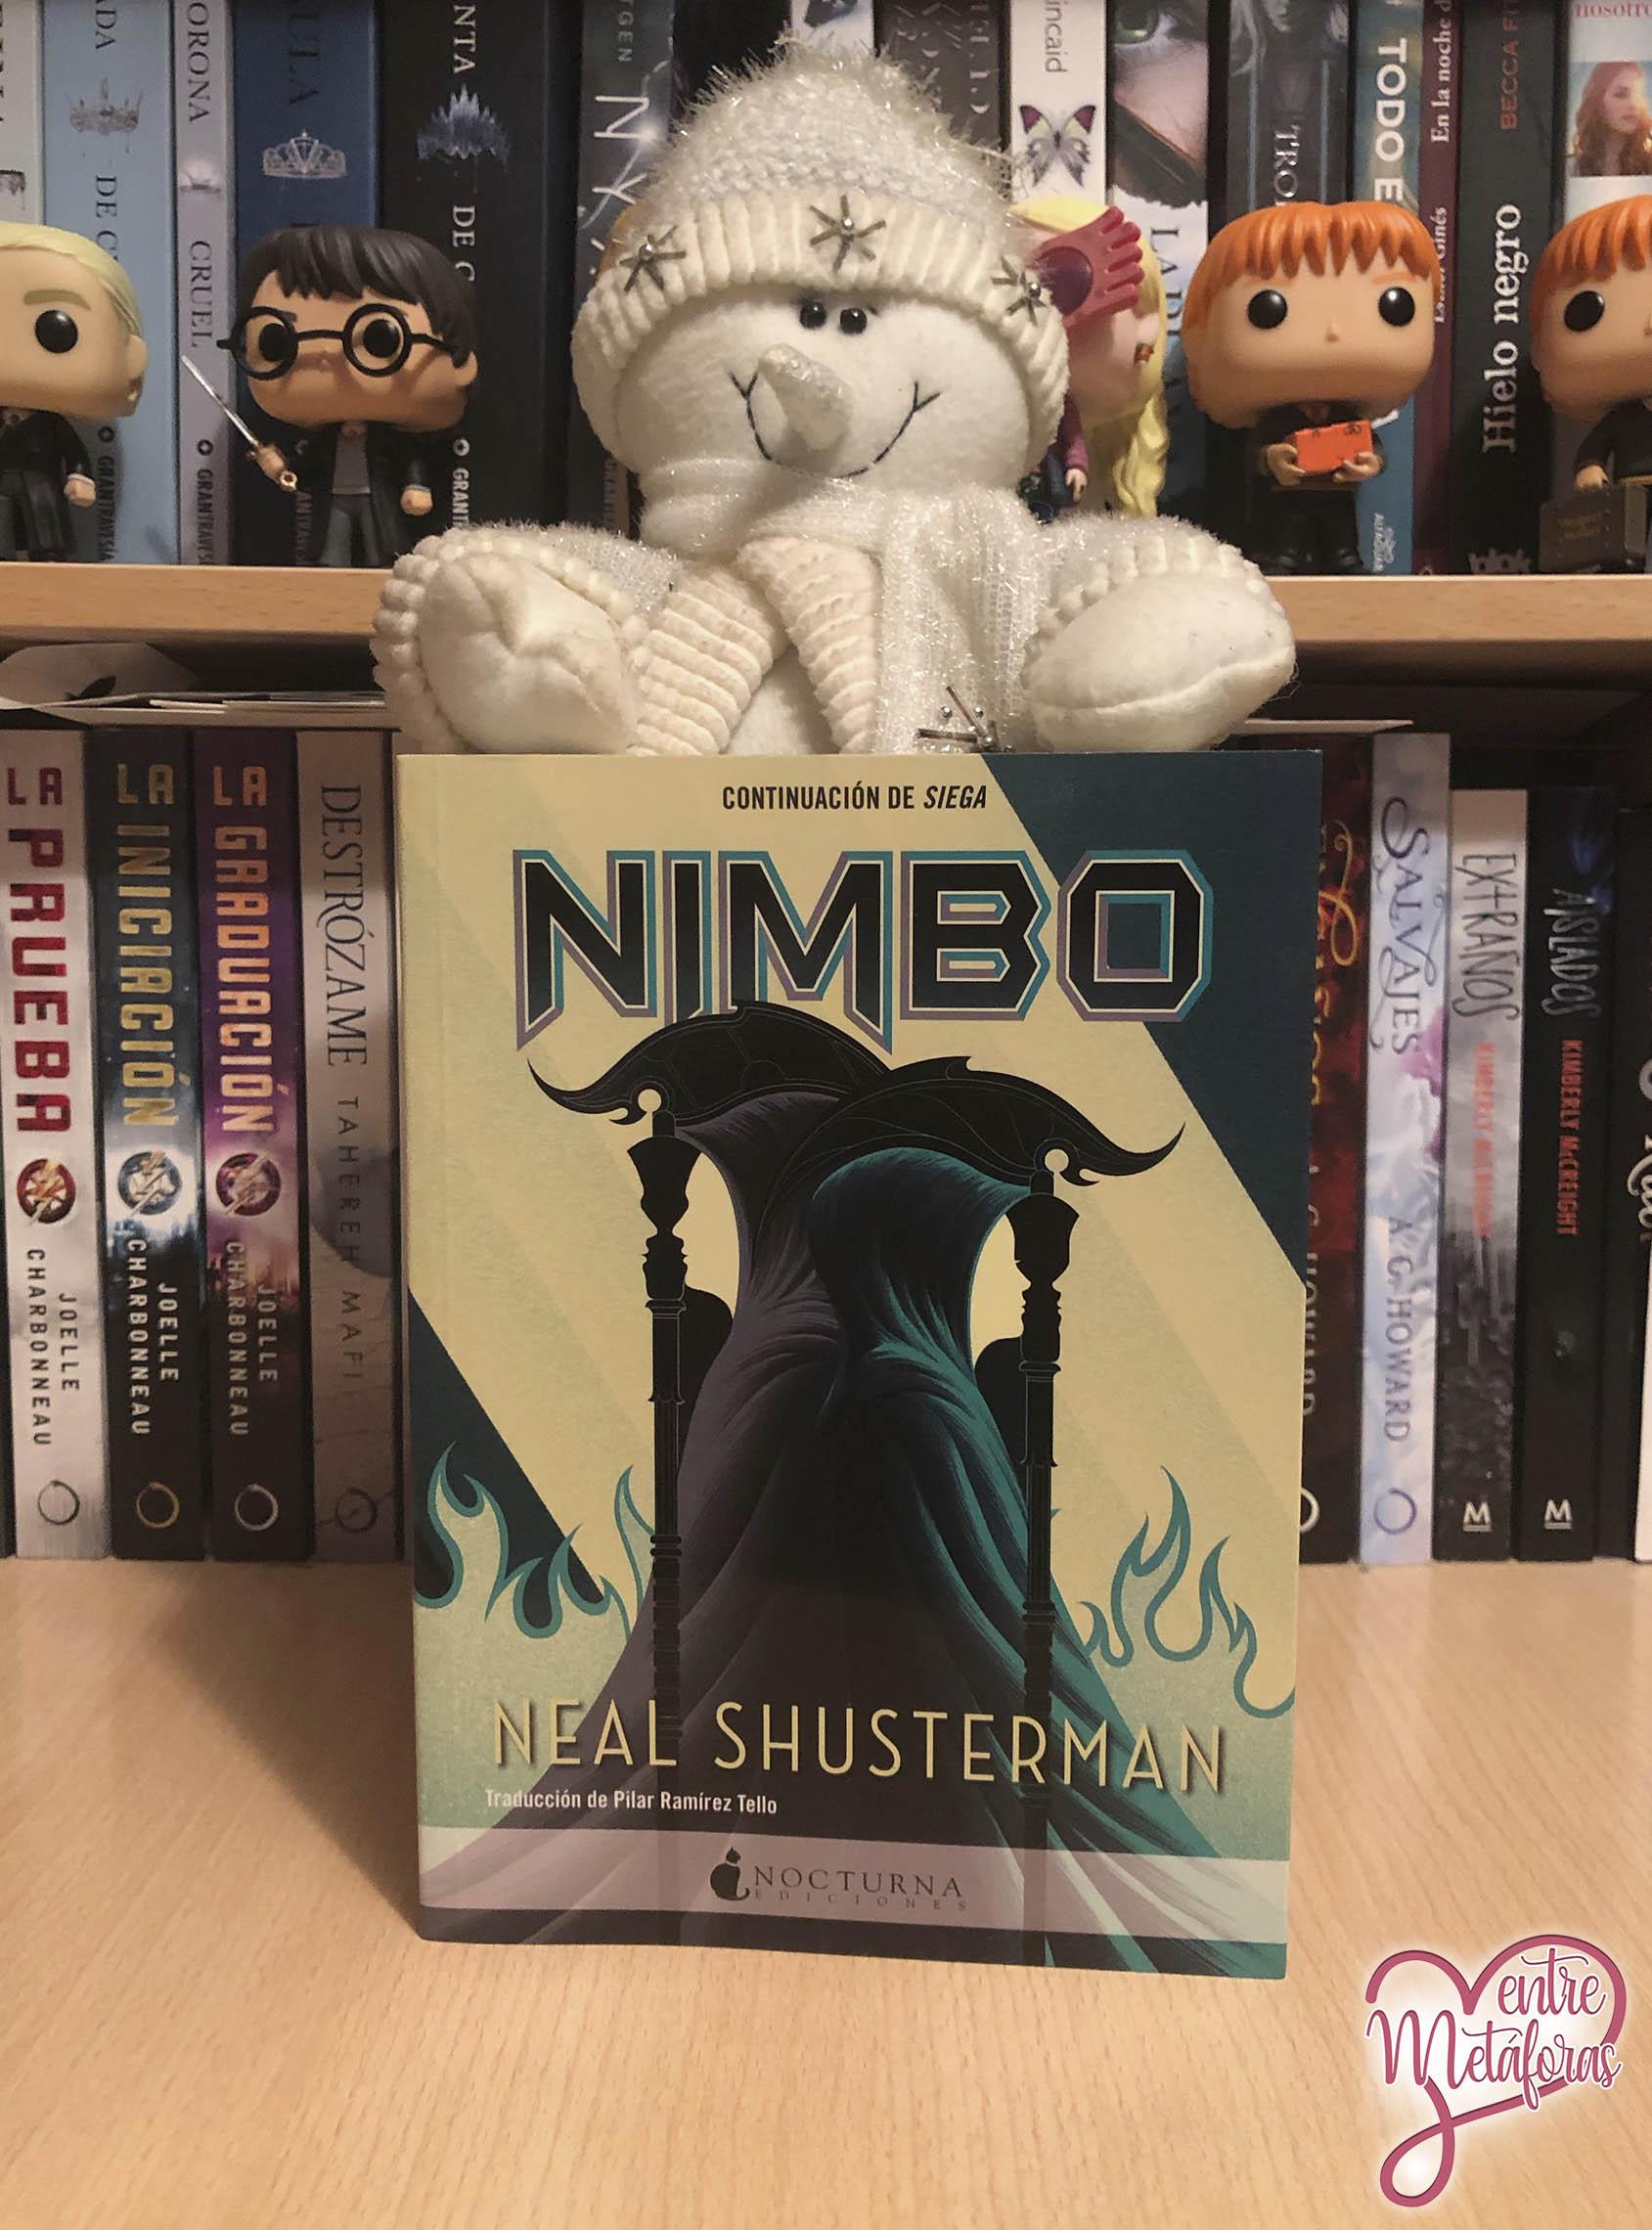 Nimbo, de Neal Shusterman - Reseña